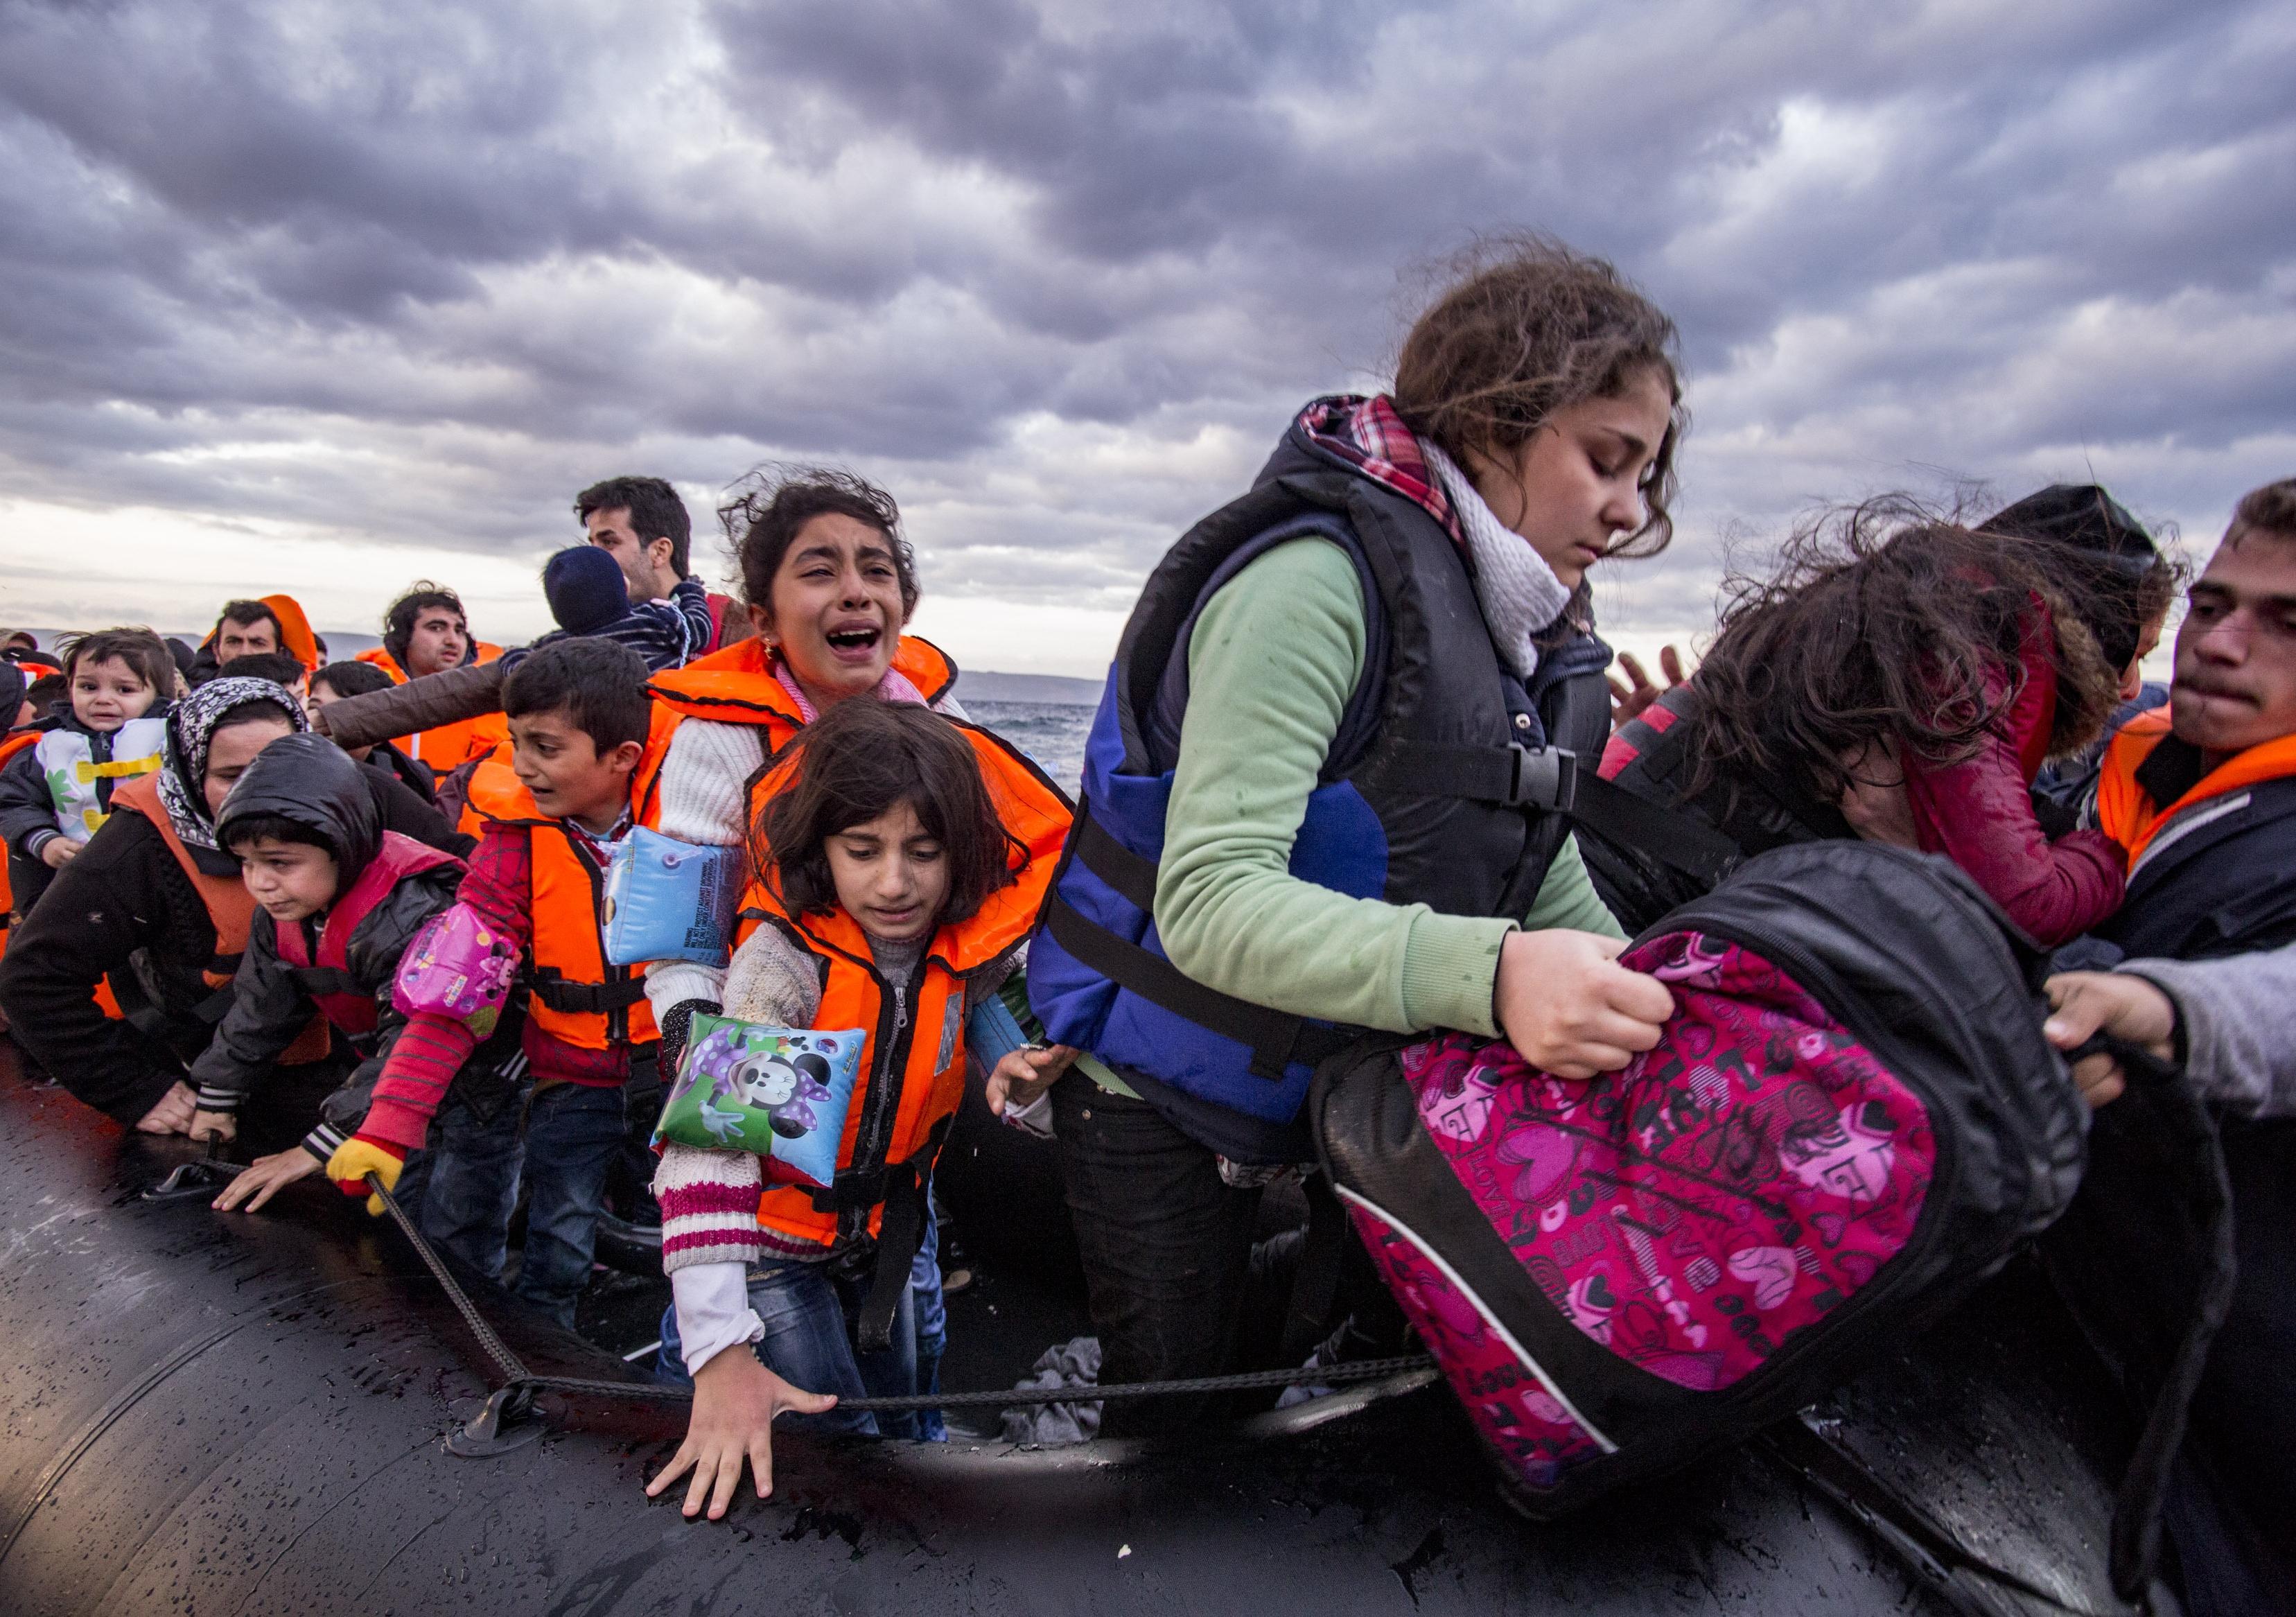 Syrian asylum seekers arrive on Lesvos island, Greece, in October 2015: Photo: Nicolas Economou / Shutterstock.com